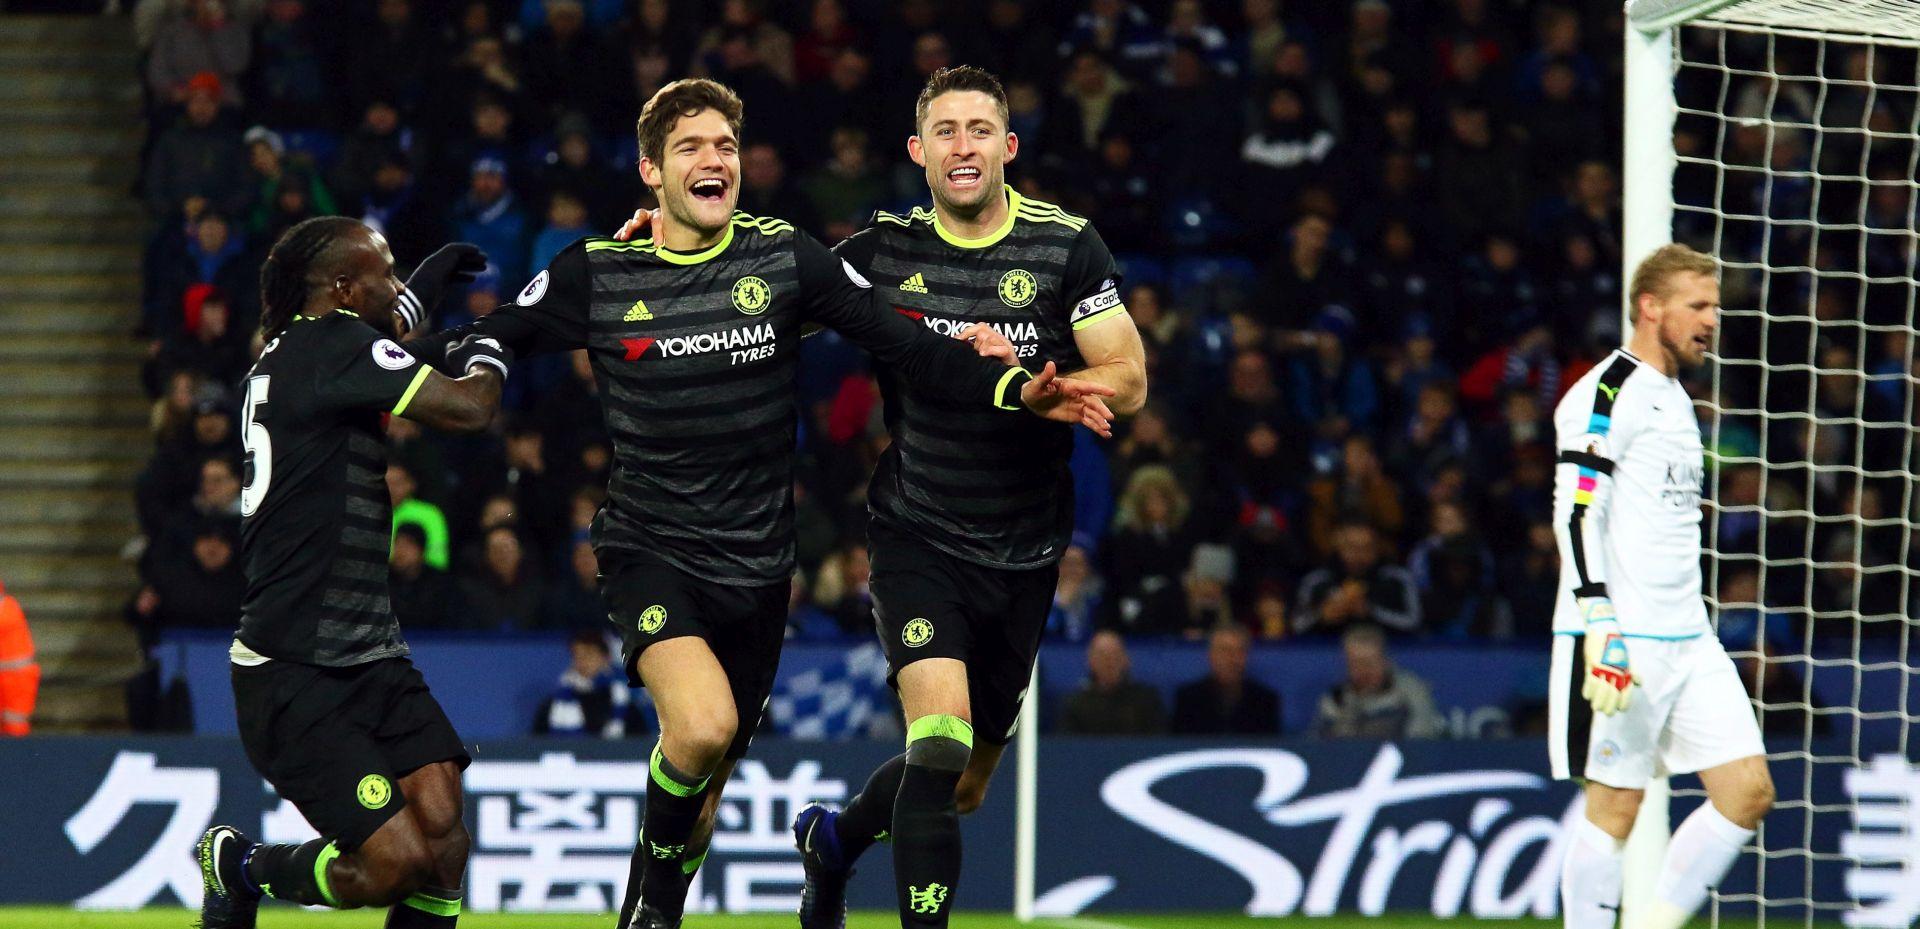 PREMIERLIGA Chelsea lako protiv prvaka Leicestera, dva pogotka Alonsa